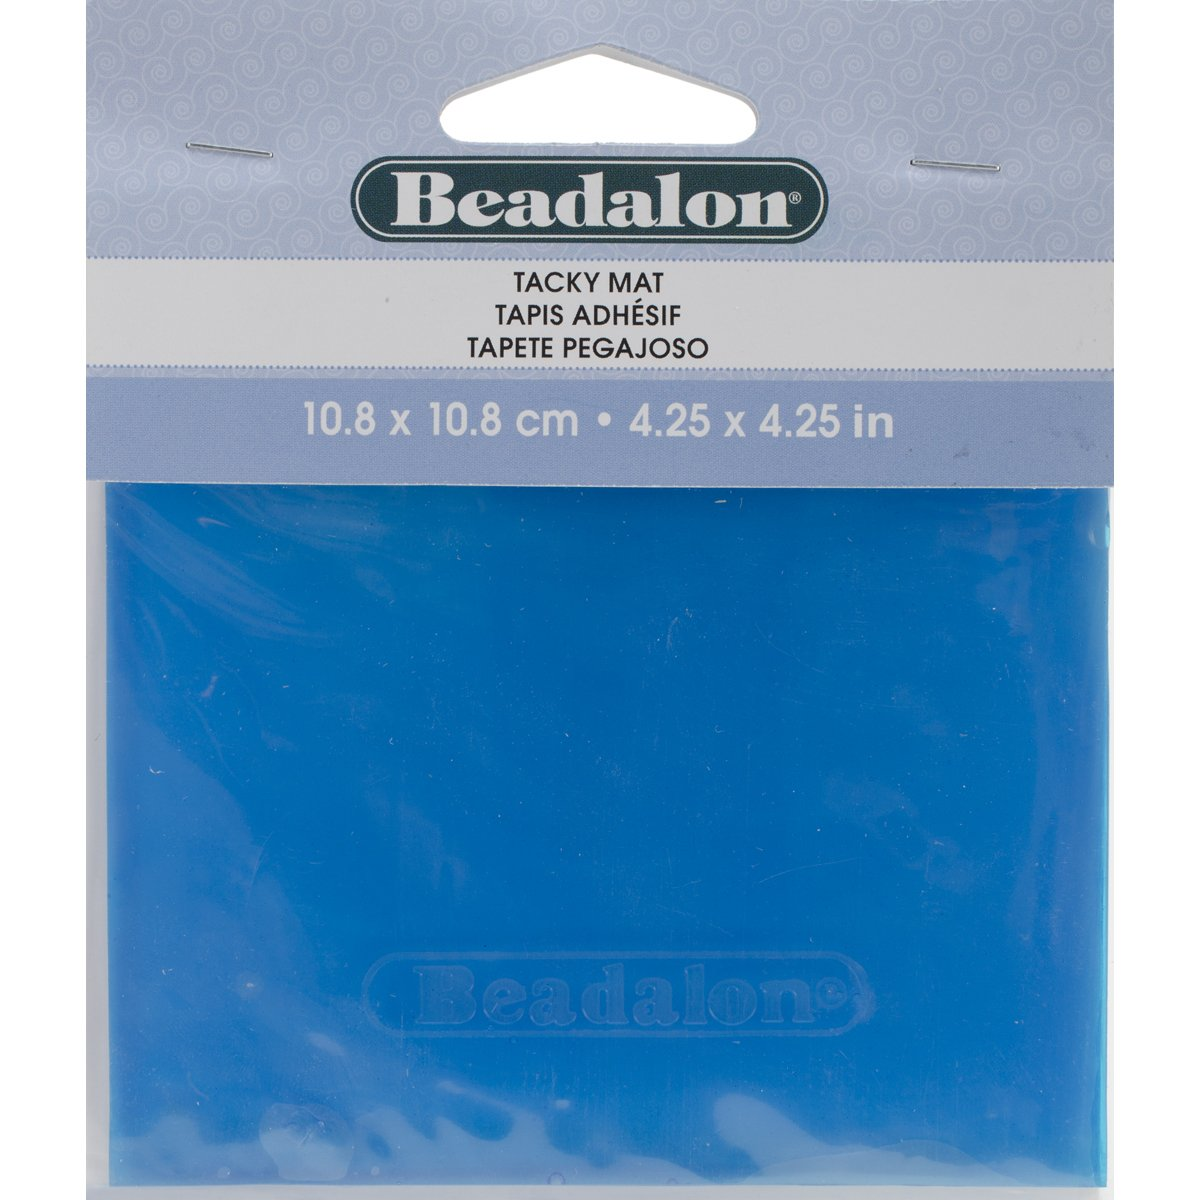 Tacky Bead Mat-4.25X4.25 BEADALON 218H200